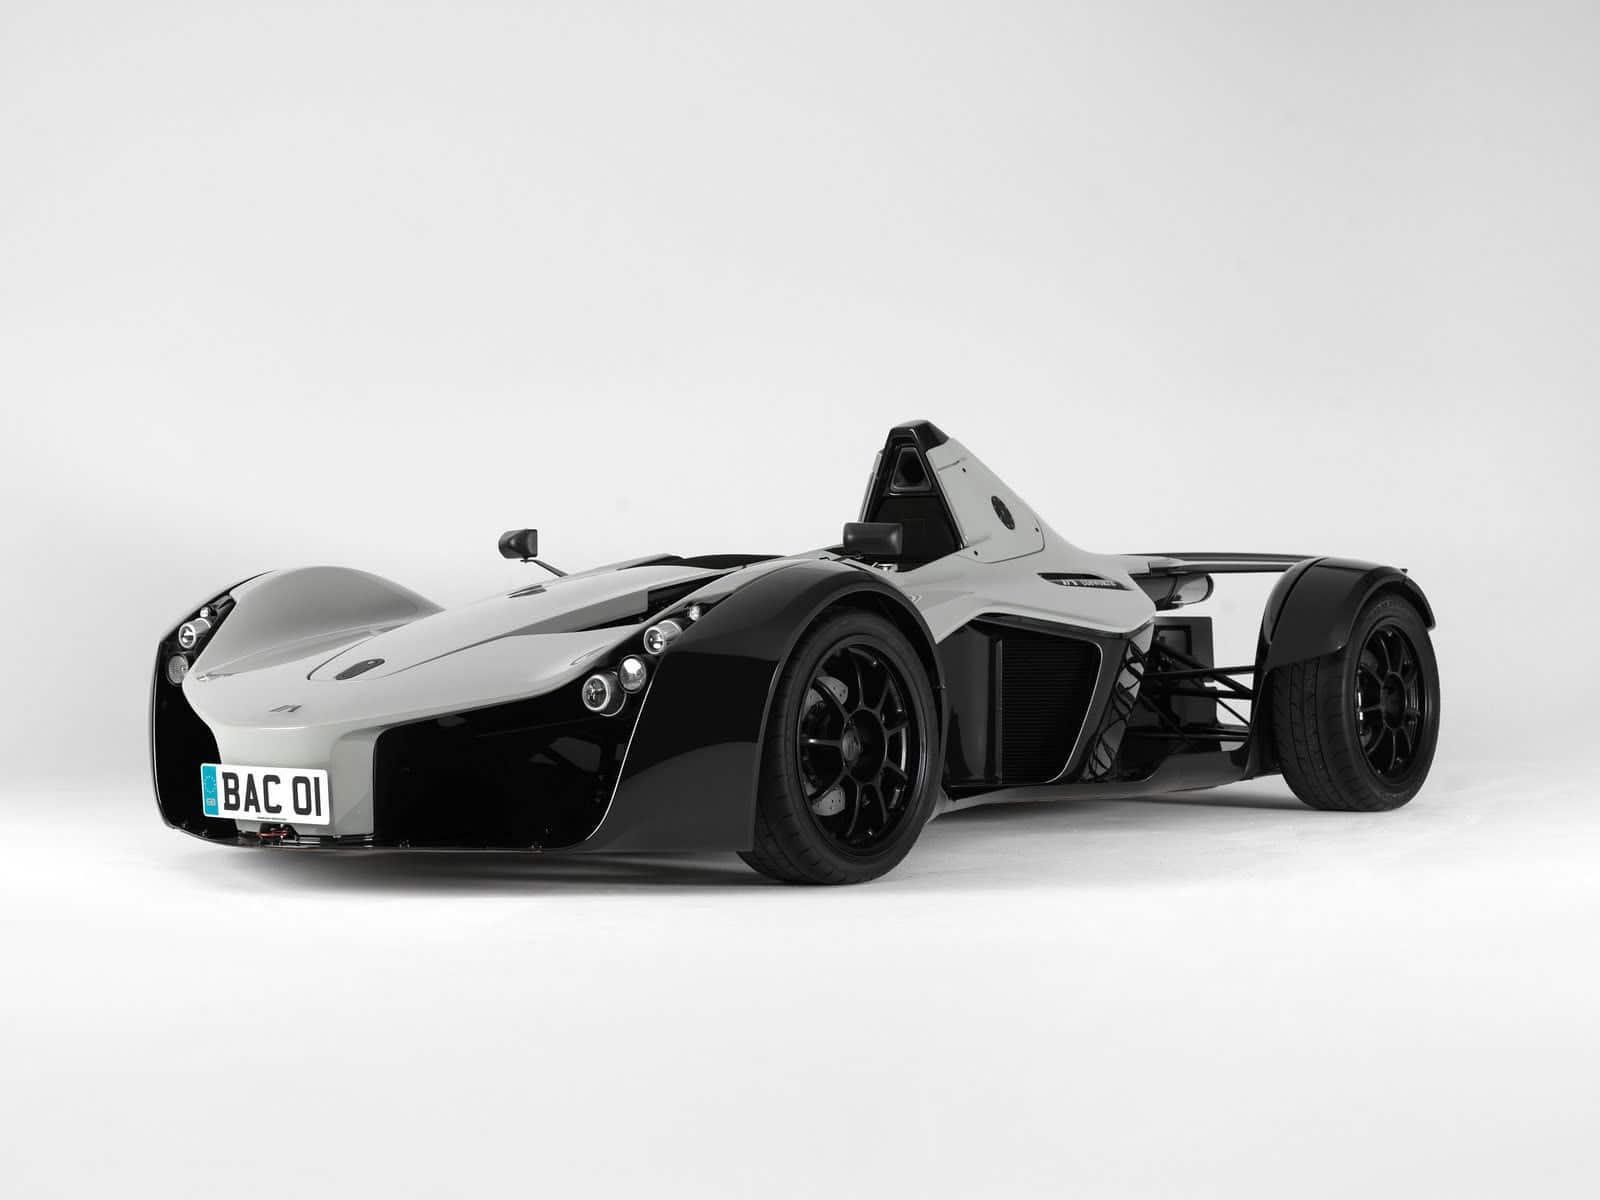 Limited edition BAC Mono single-seater race car